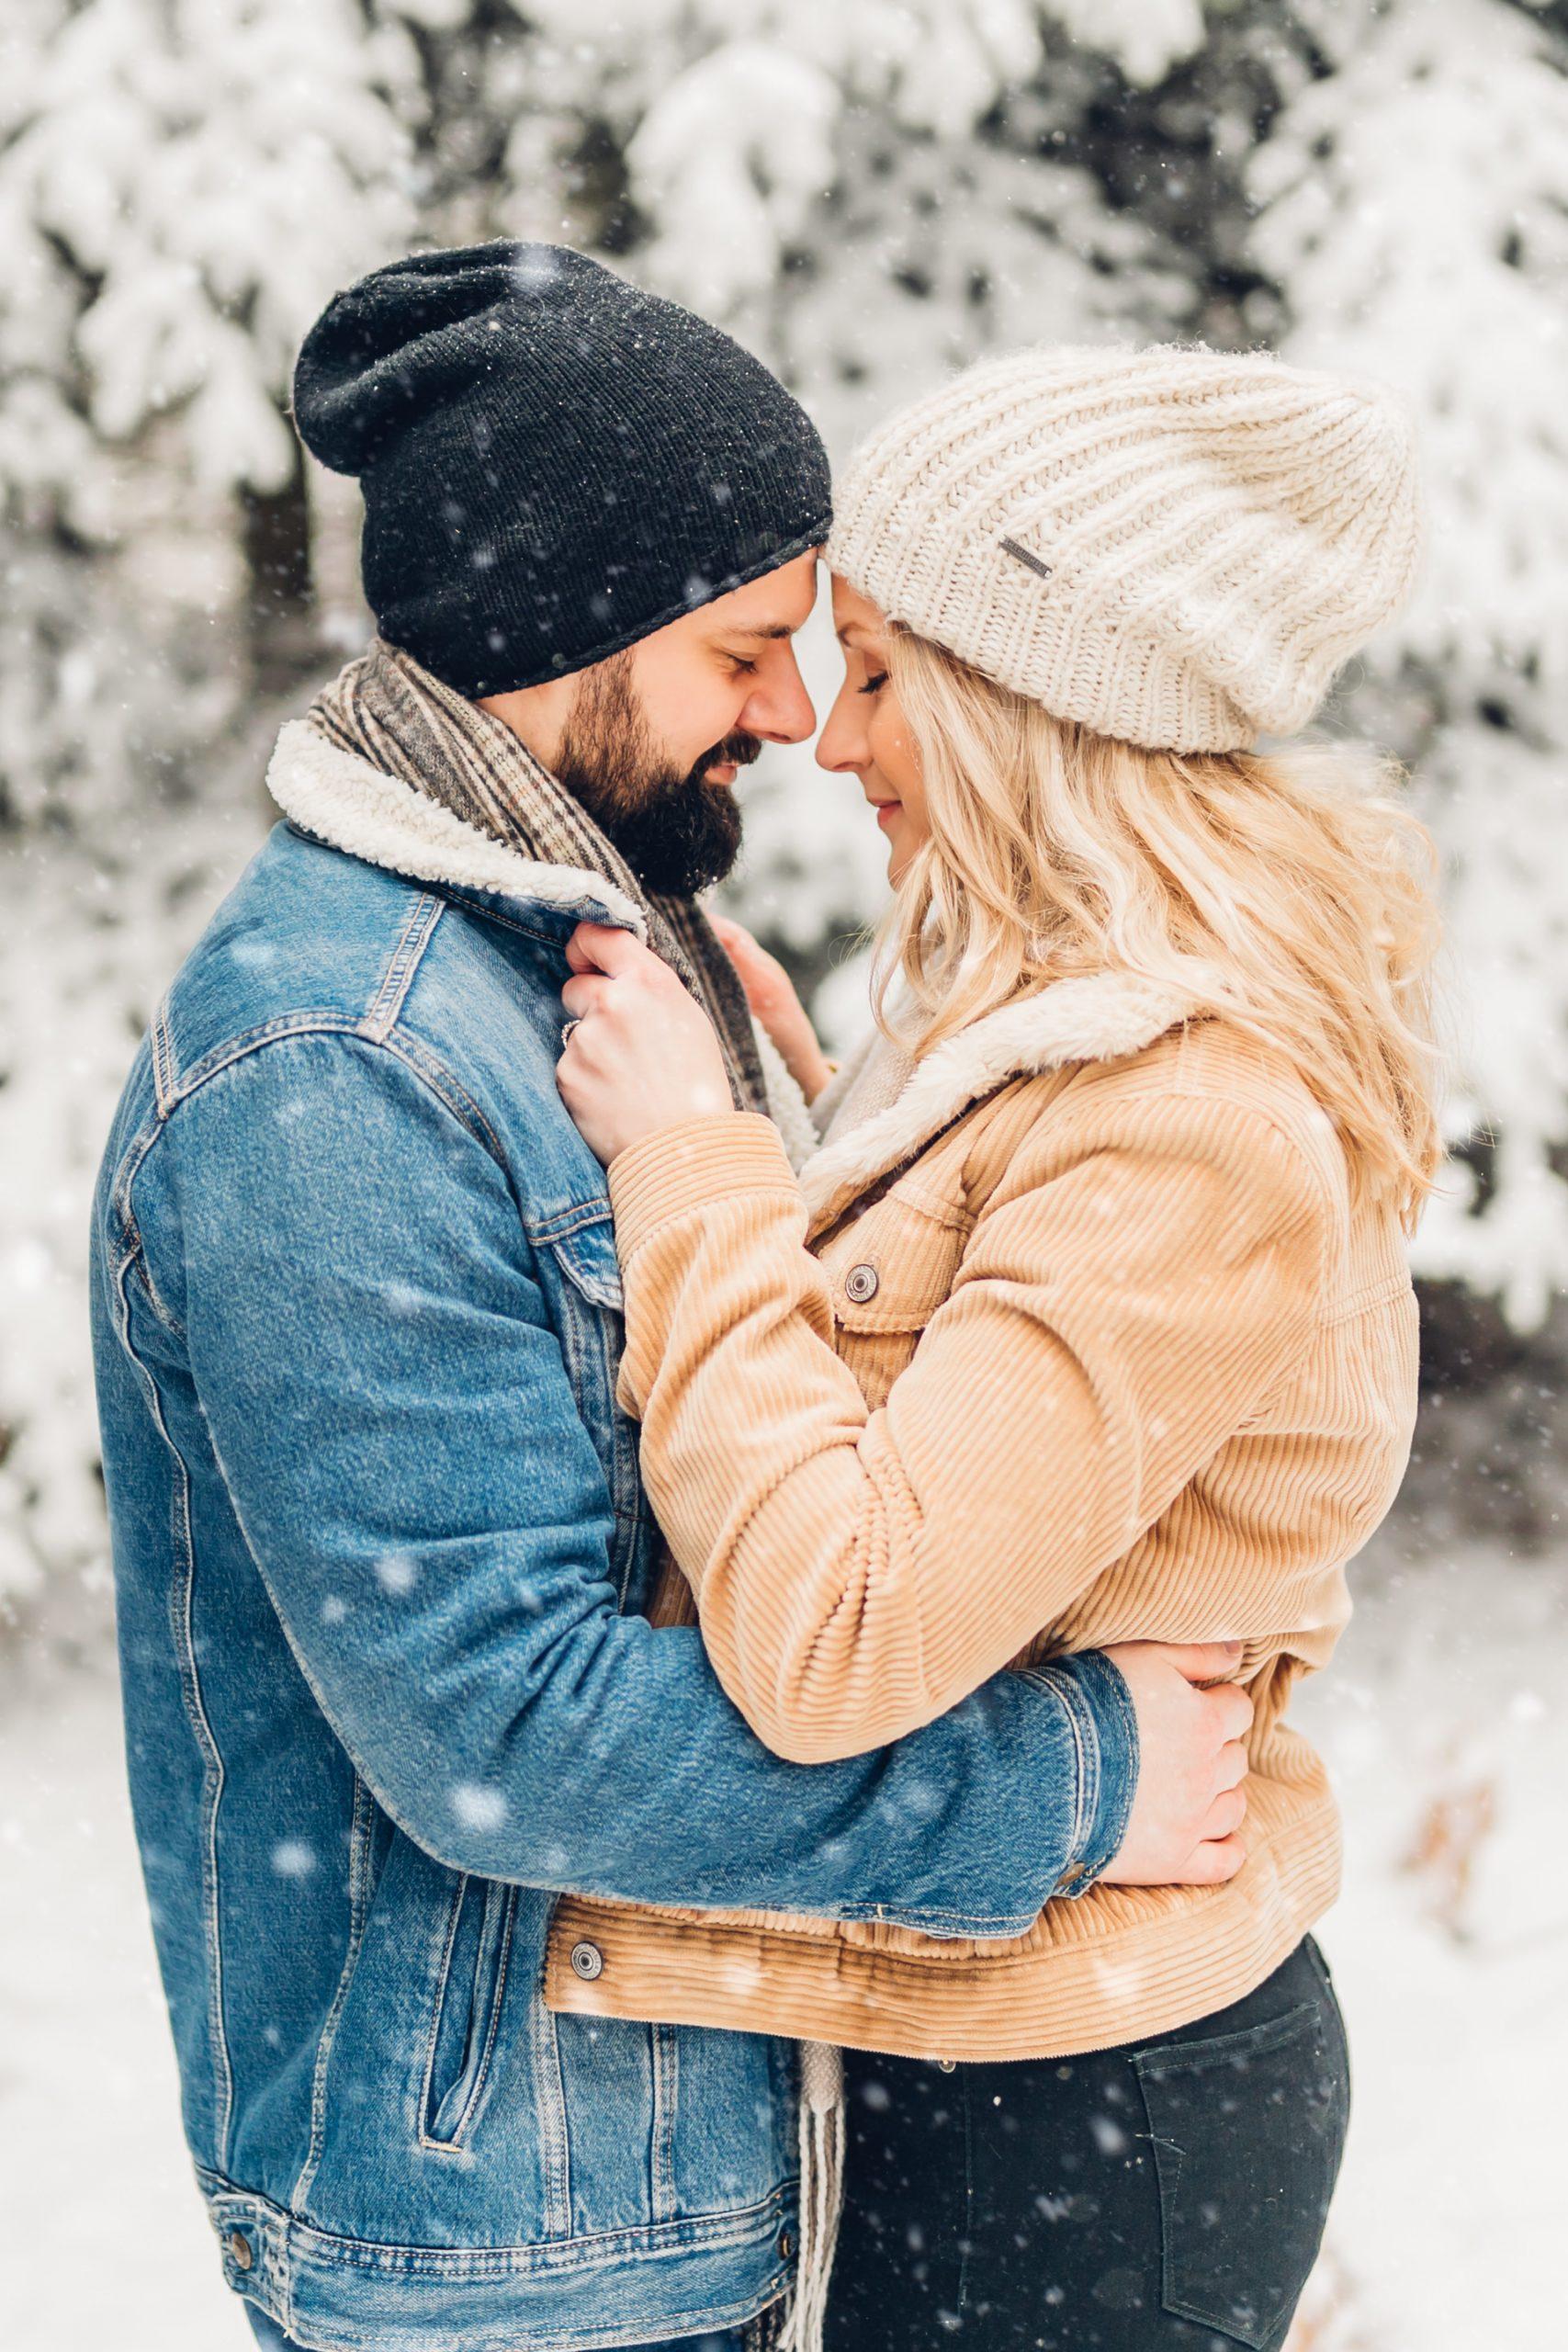 Lovebirds Coupleshooting im Schnee